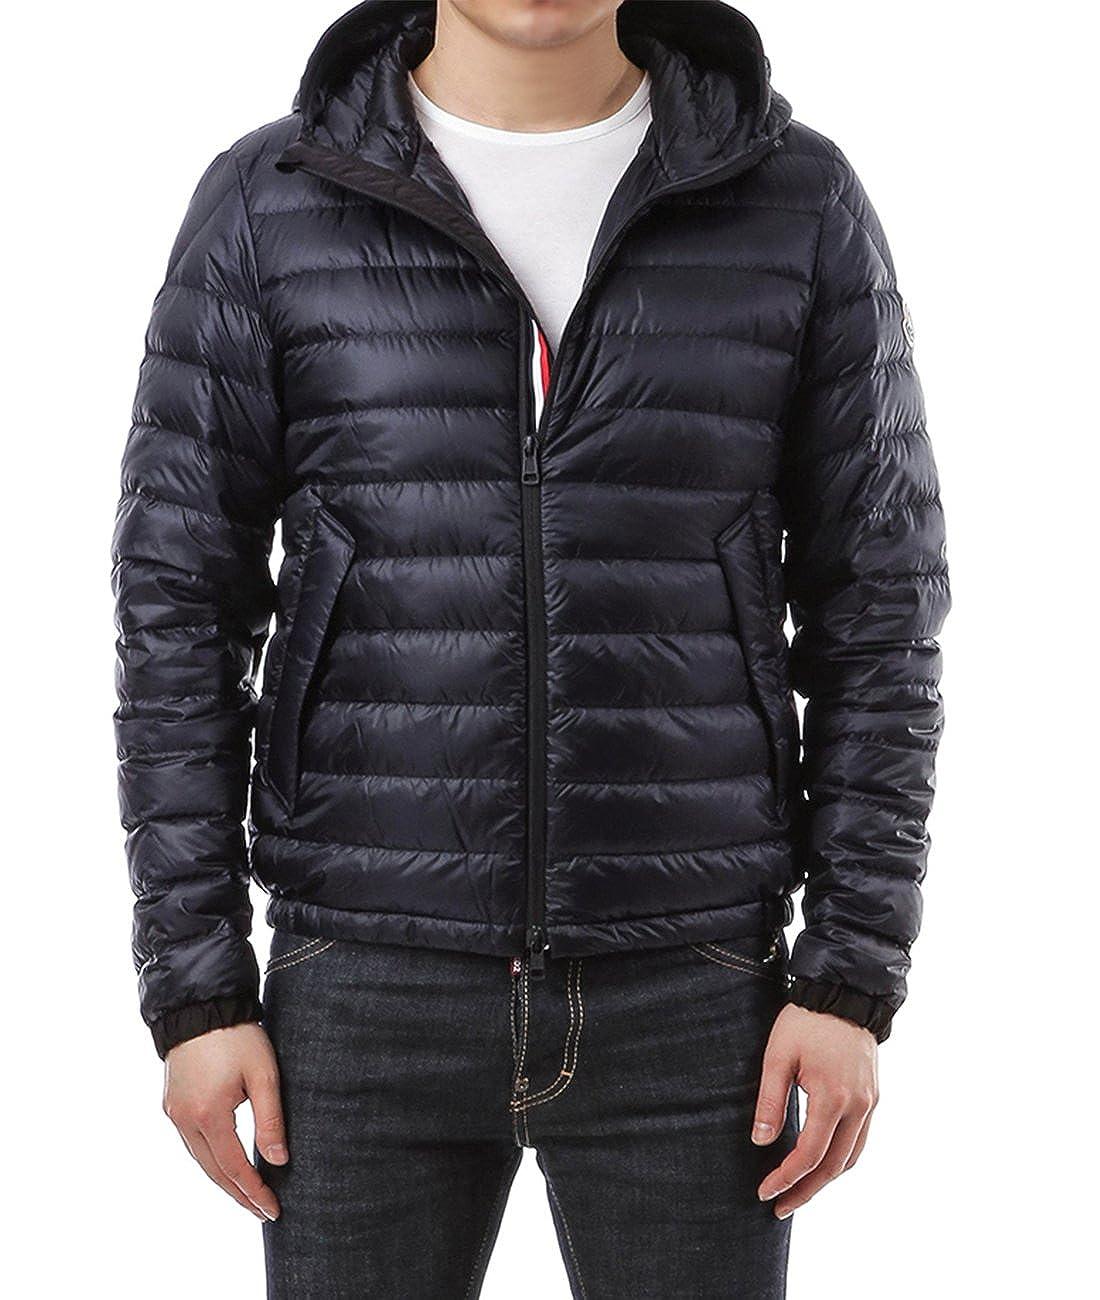 701ab98726d4 Wiberlux Moncler Morvan Men s Hooded Down Padded Zip-up Jacket 4 ...